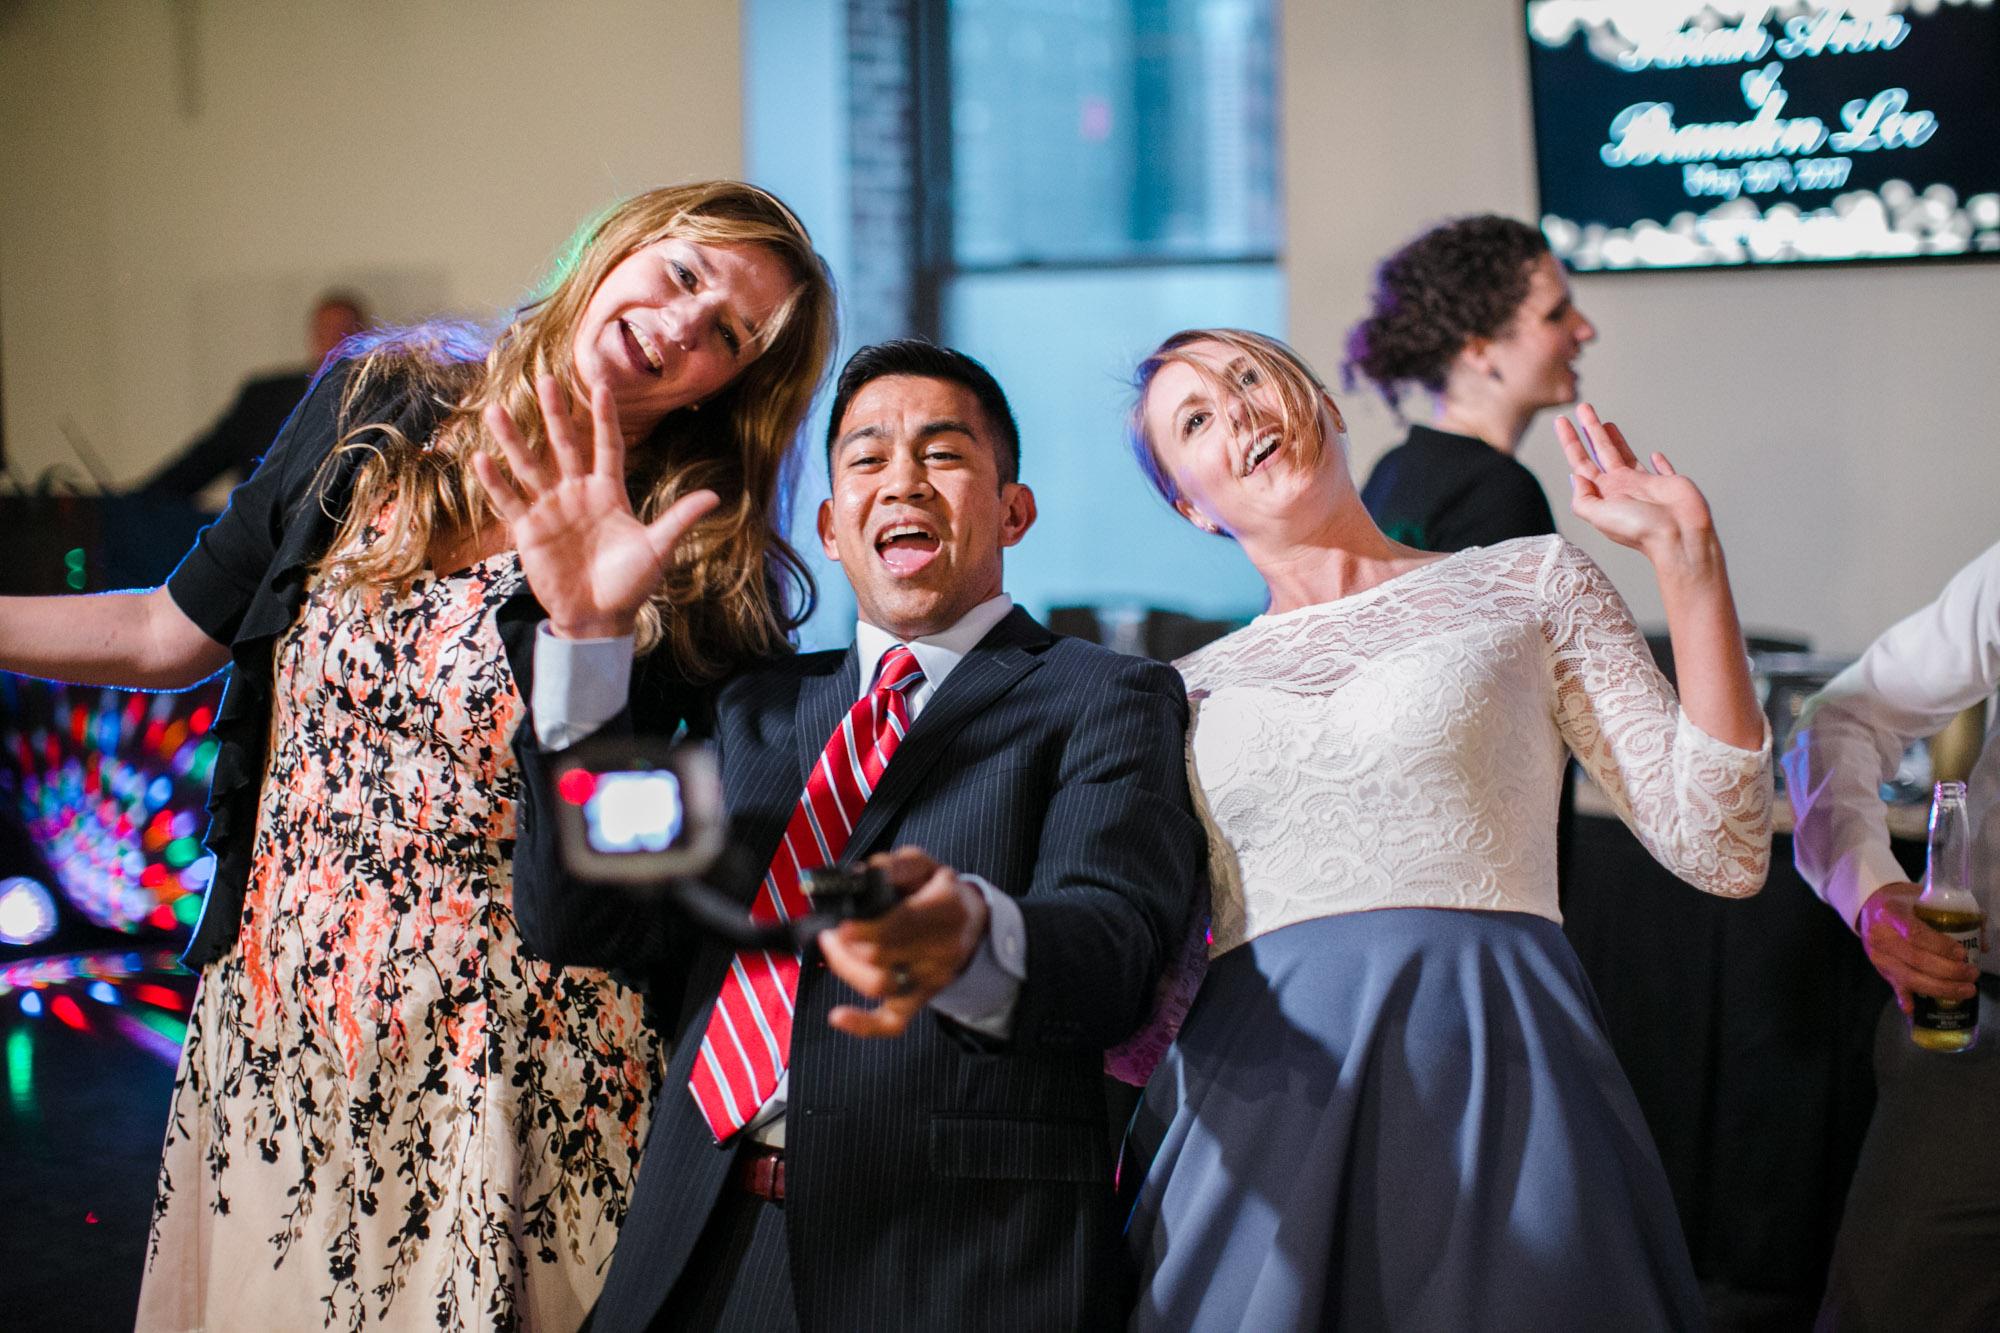 hensville-wedding-downtown-toledo-ohio (3 of 5).jpg